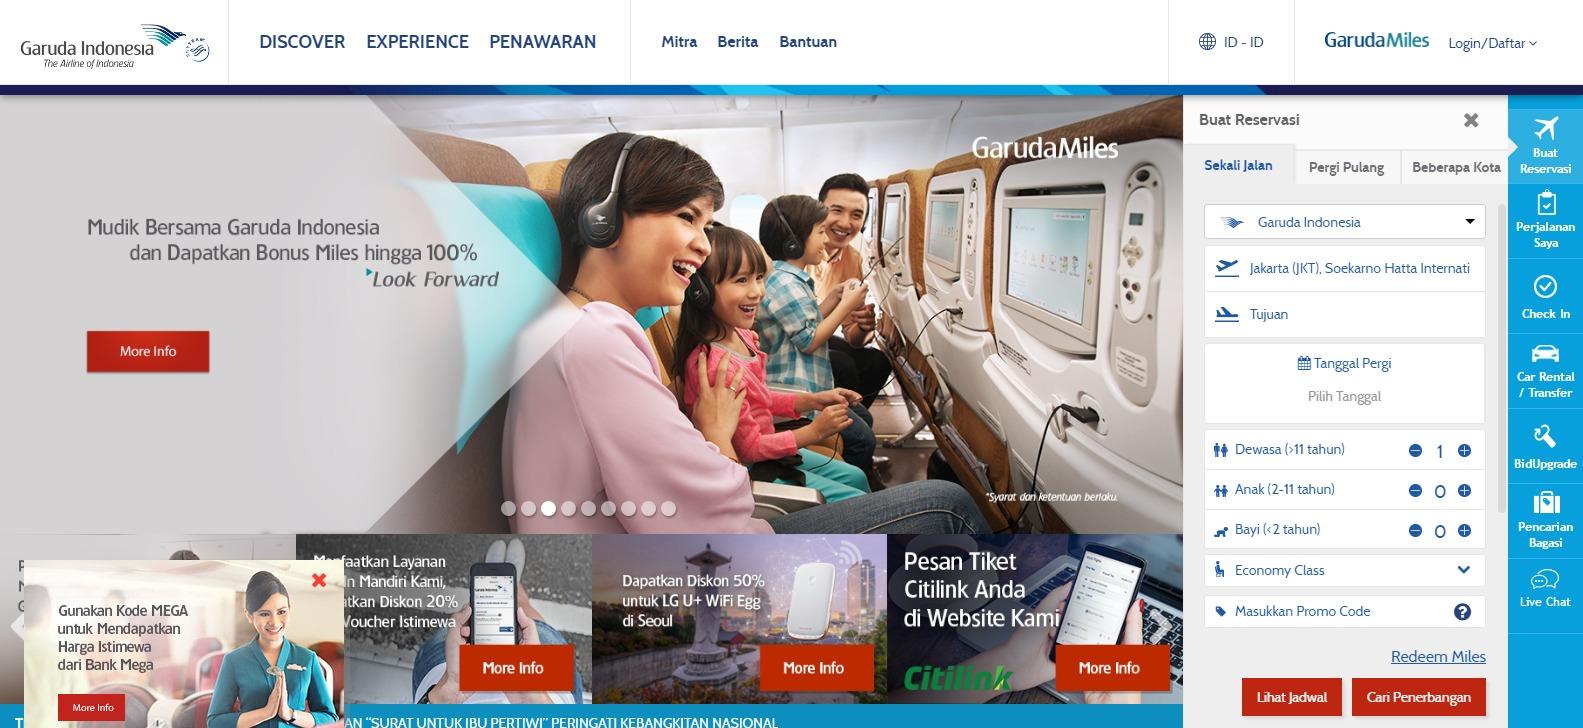 beli tiket pesawat online